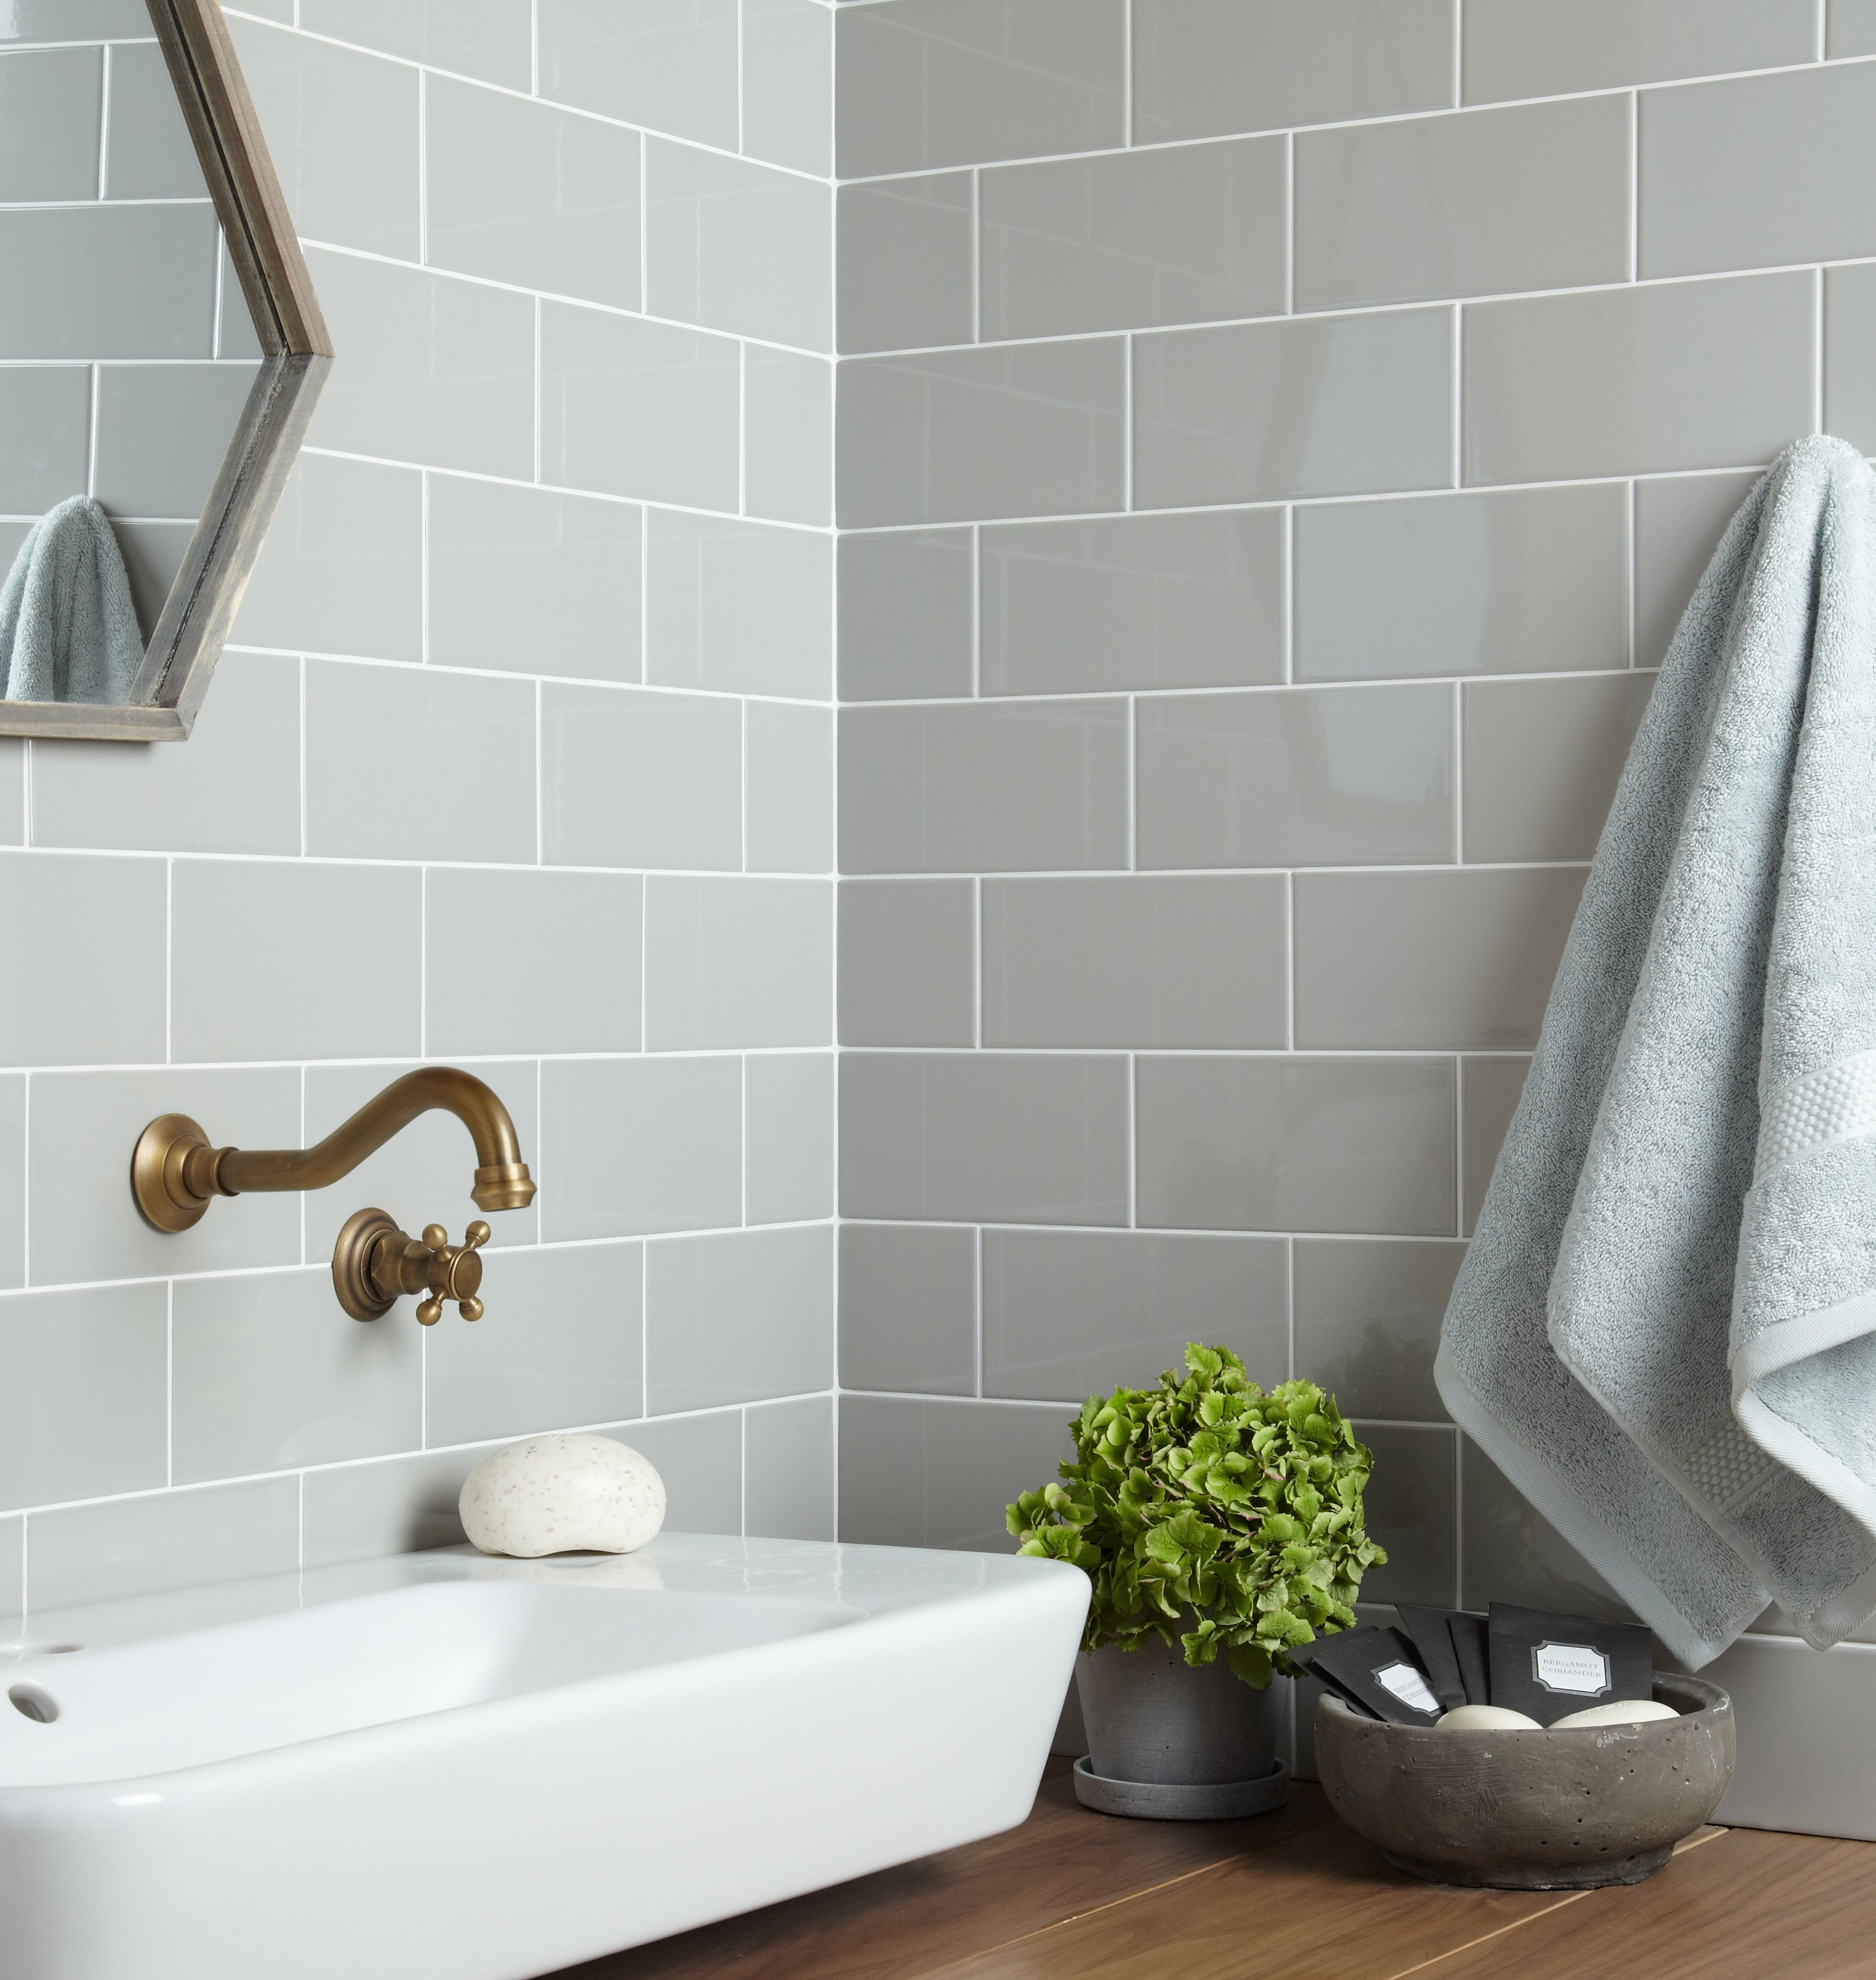 Verona Central Gloss Light Grey Ceramic Wall Tile Bathroom Wall Tile Grey Kitchen Tiles Brick Tiles Bathroom